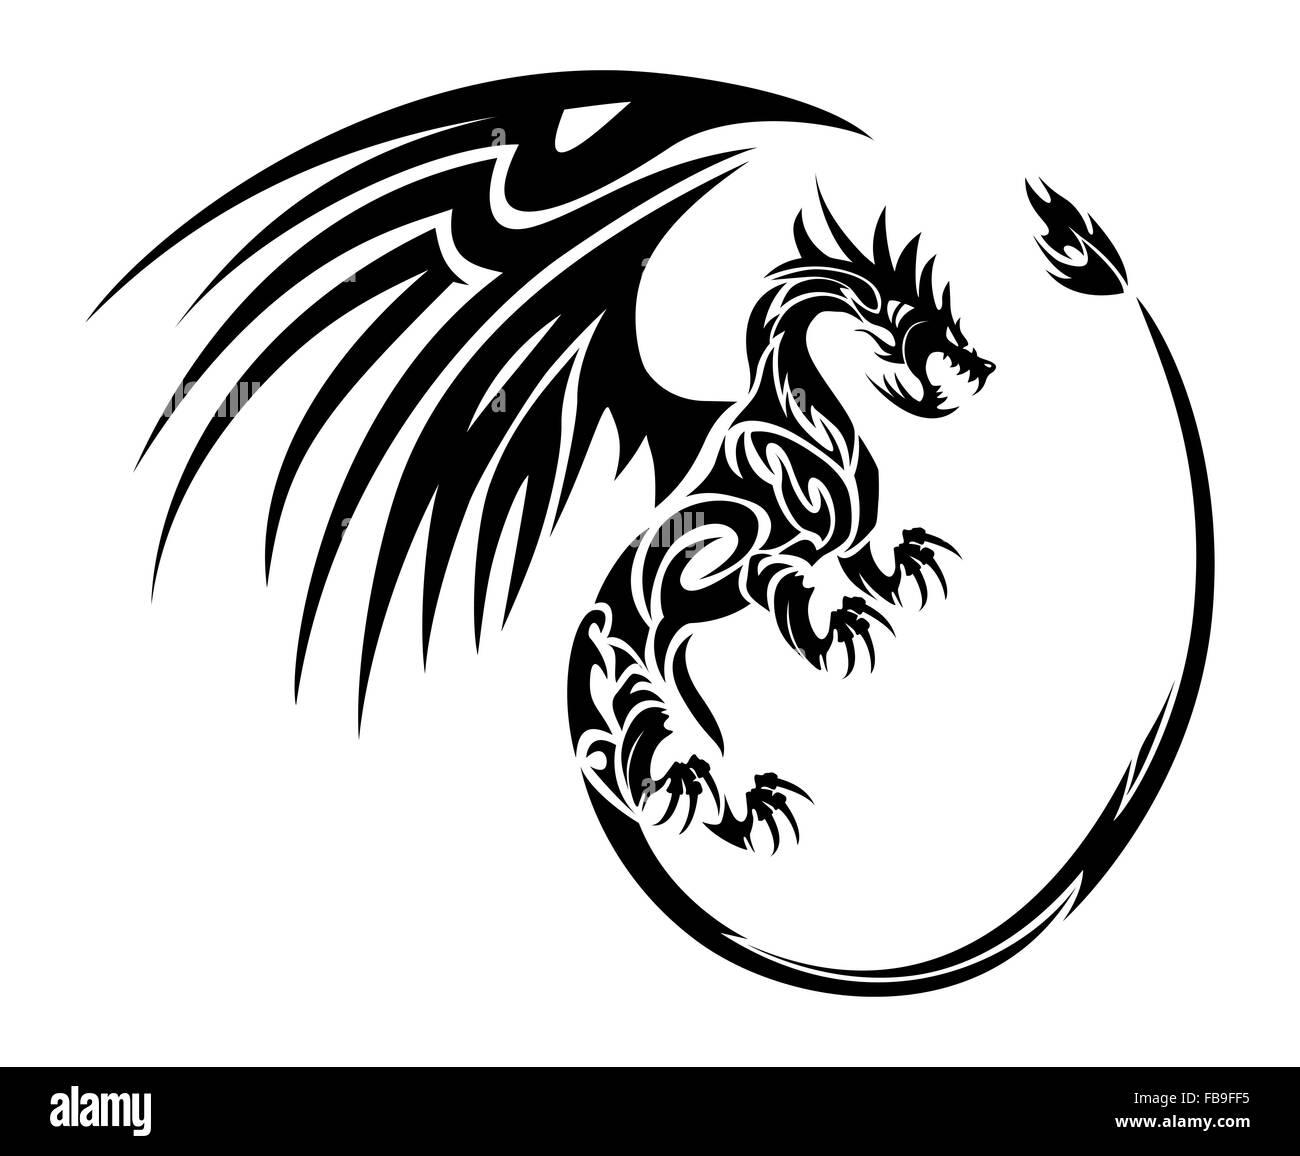 Cabezas De Dragones Para Tatuar chinese dragon tattoo imágenes de stock & chinese dragon